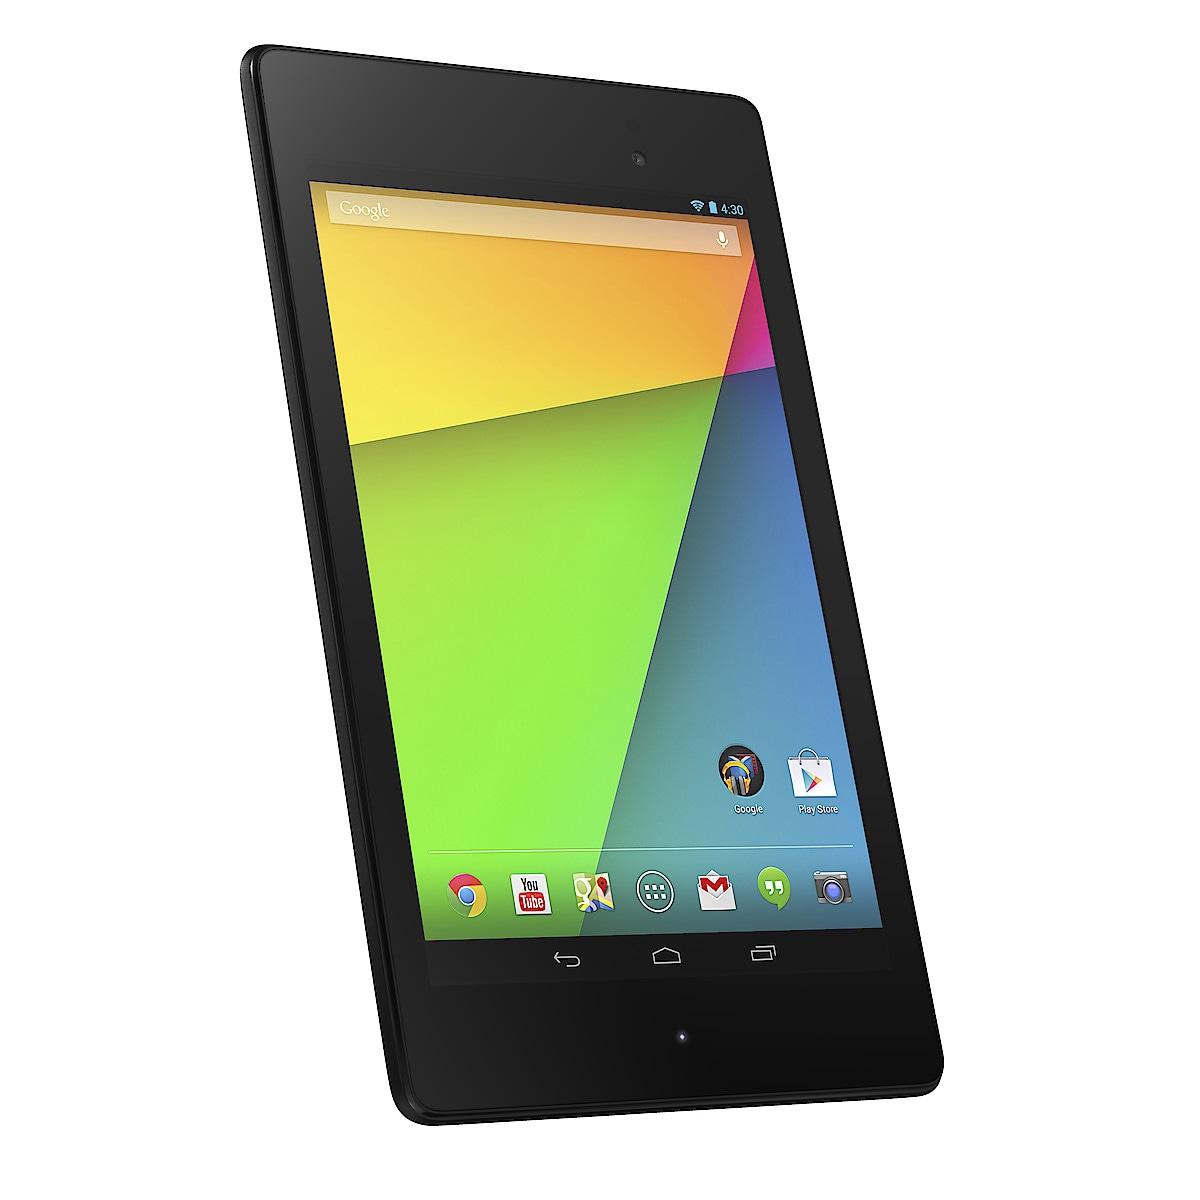 Tabletti Asus Google Nexus 7 V2 HD, 32 GB WiFi